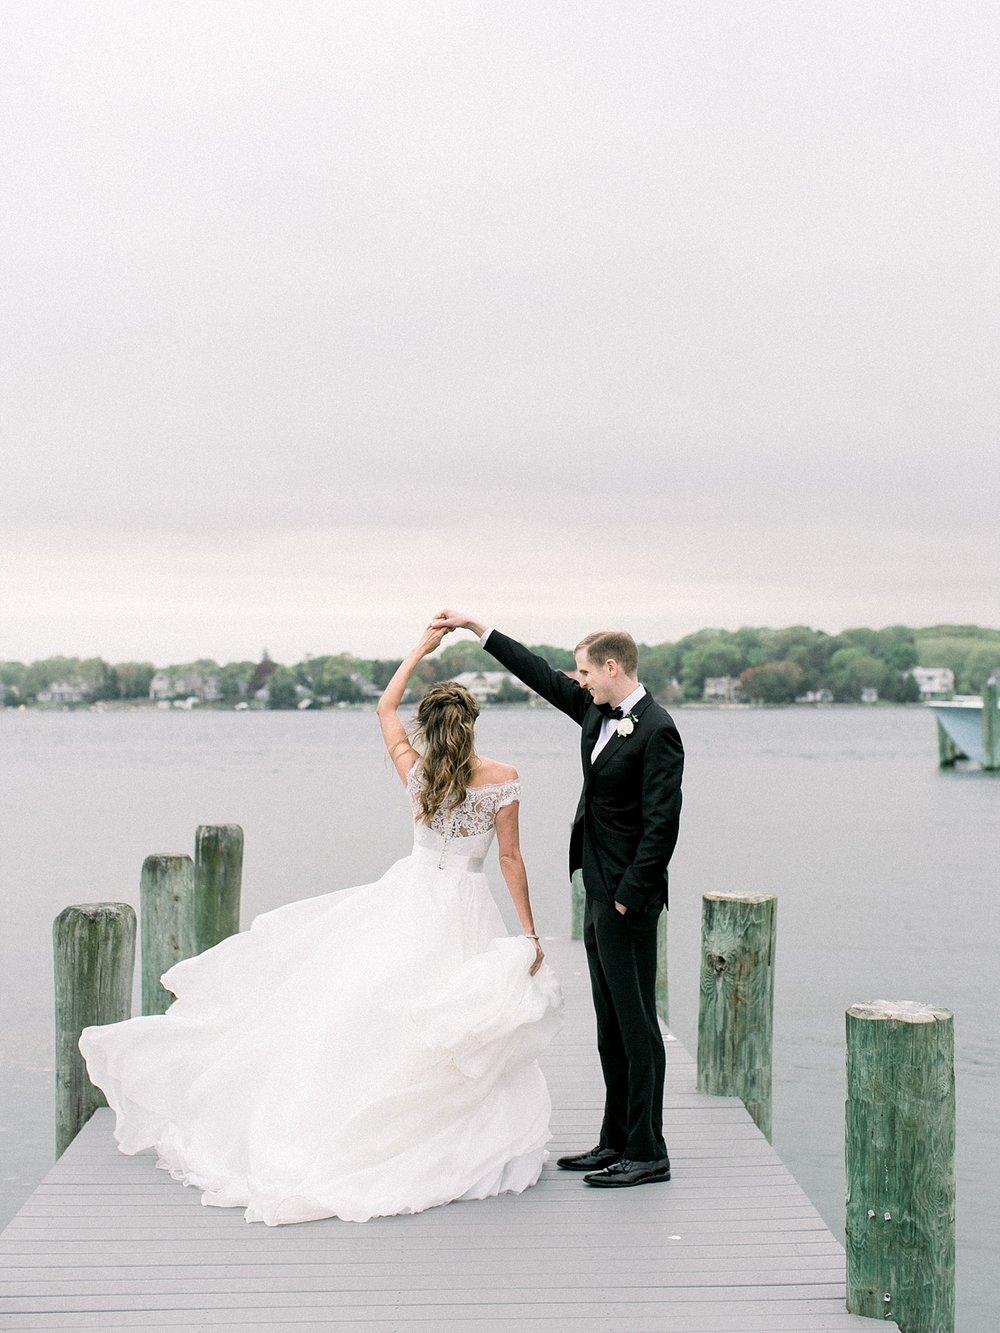 clarks_landing_nj_wedding_photography_0066.jpg